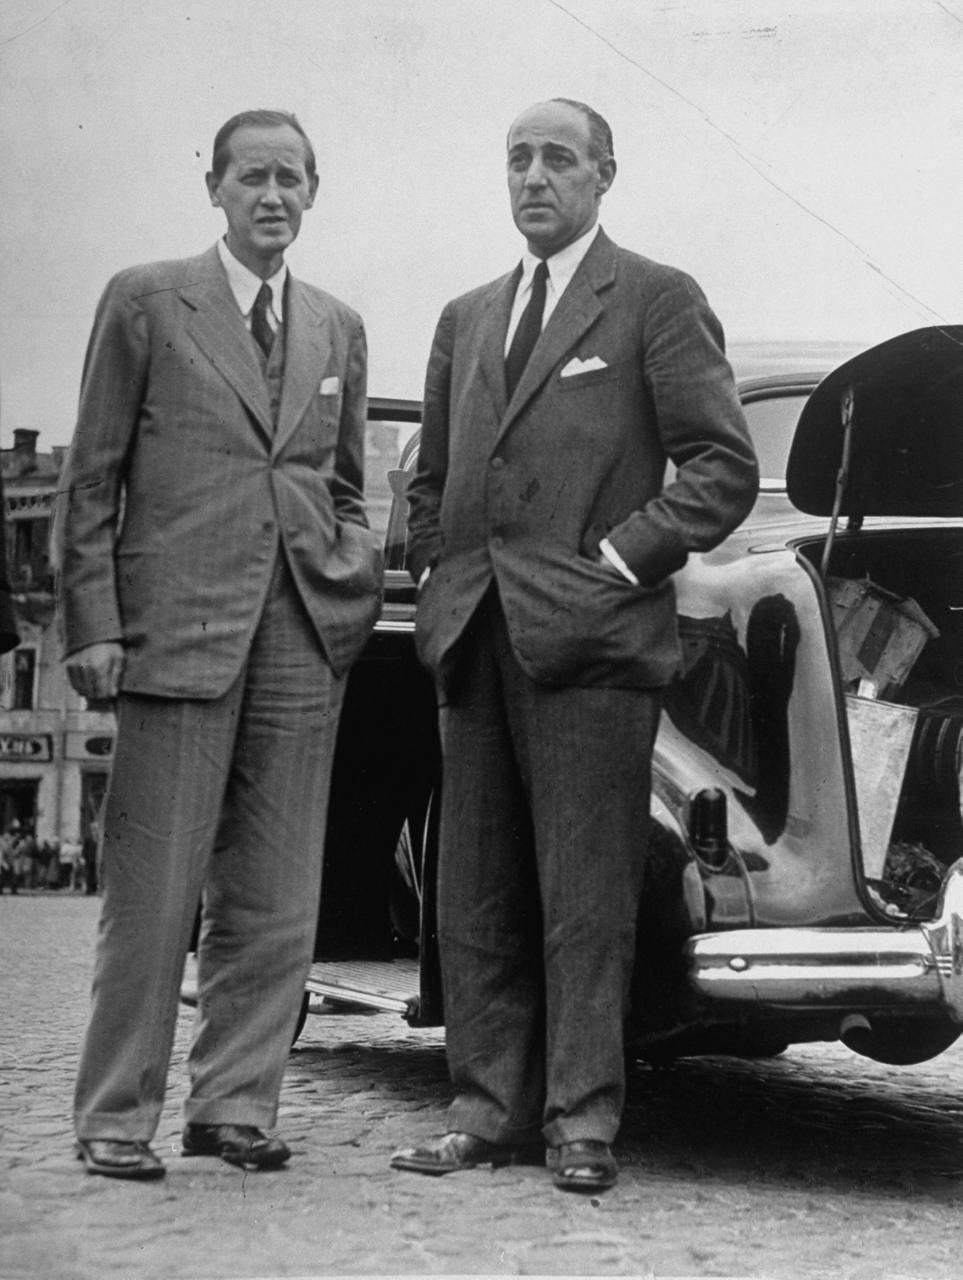 86Гарри Хопкинс и посол США. Лоуренс Стейнхардт.